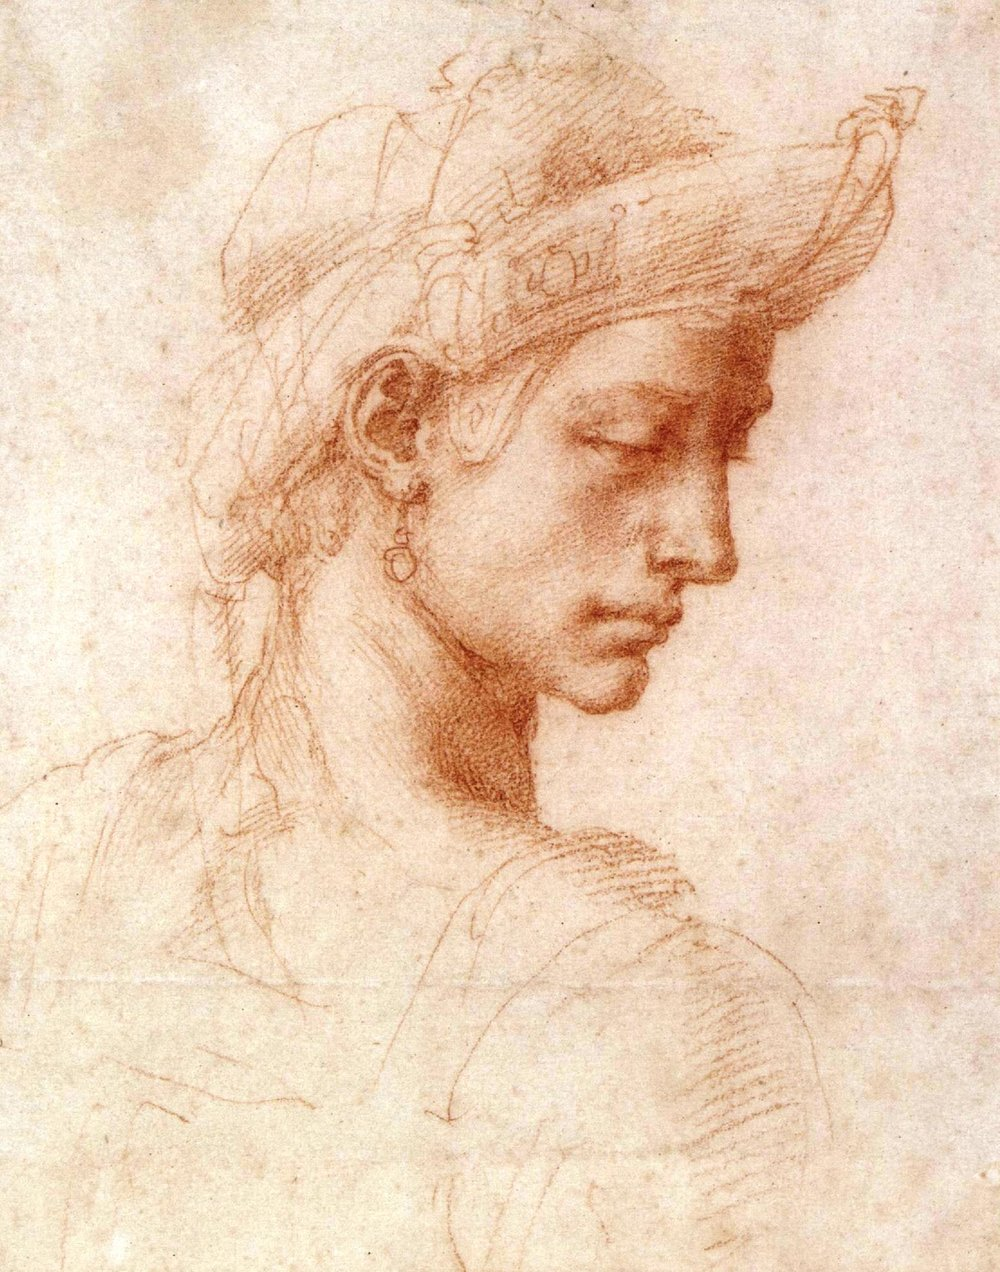 26601e0082ccb62b27fe3d3d9f5b45c7_photo-realistic-rendering-vs-hatching-drawing-academy-drawing-michelangelo-portrait-drawing_1663-2116.jpg